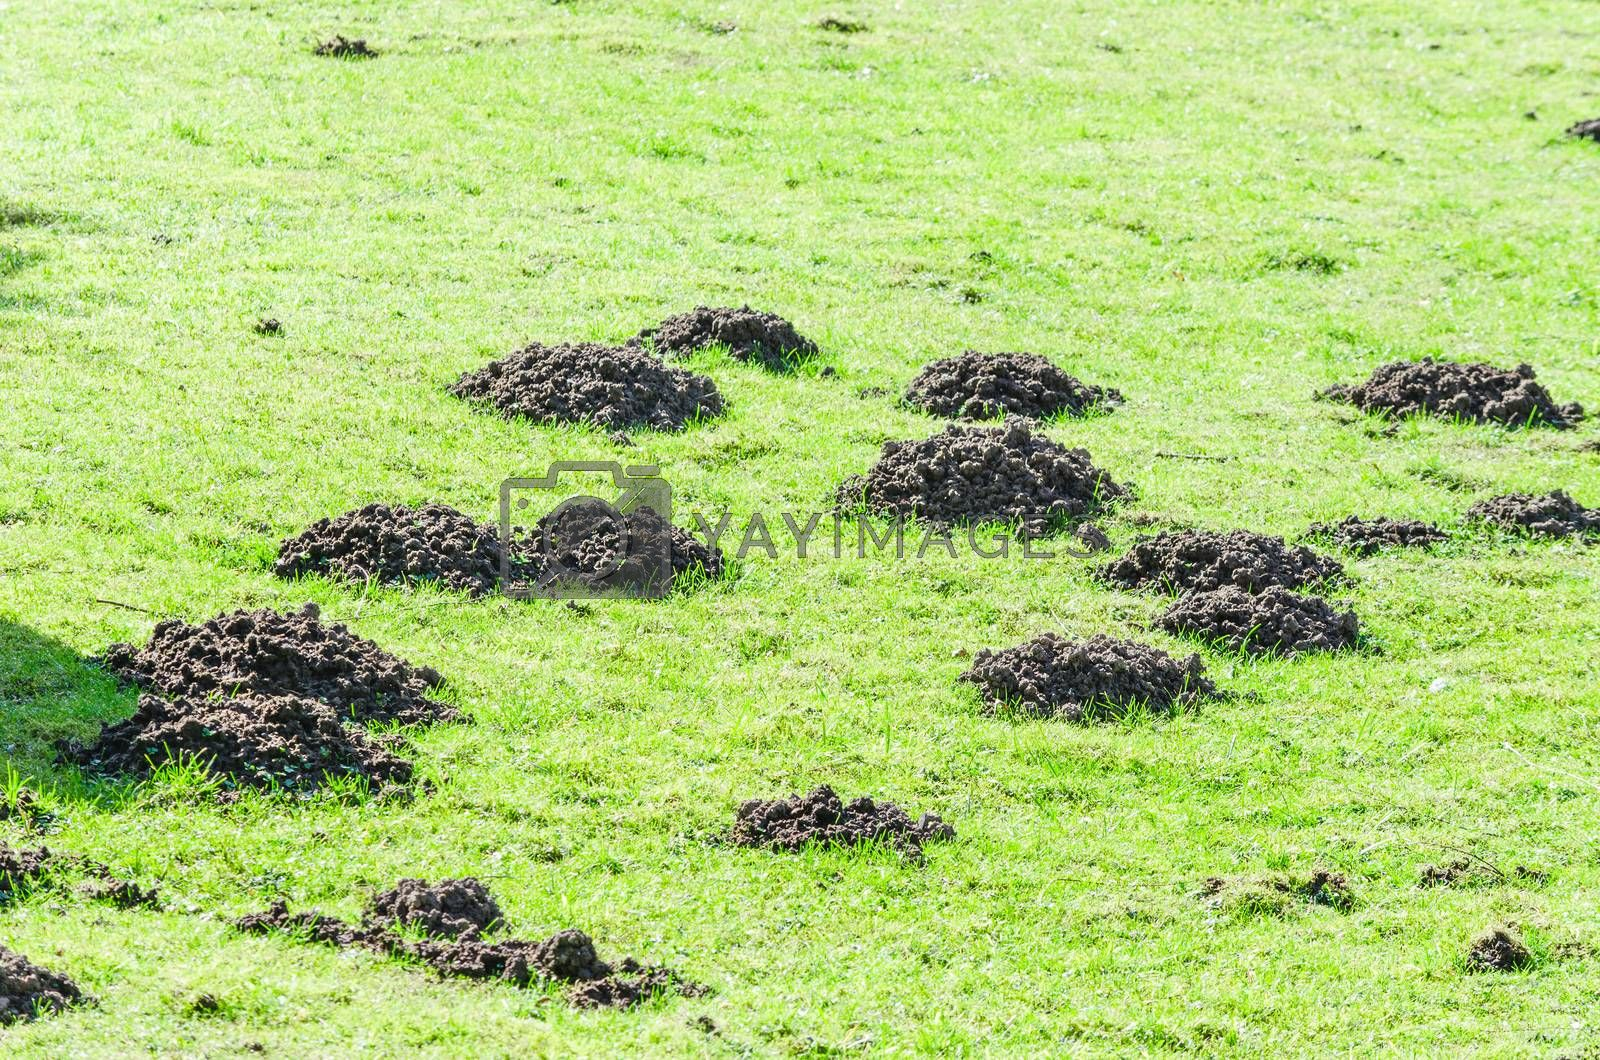 Various molehill on a lawn in the garden.